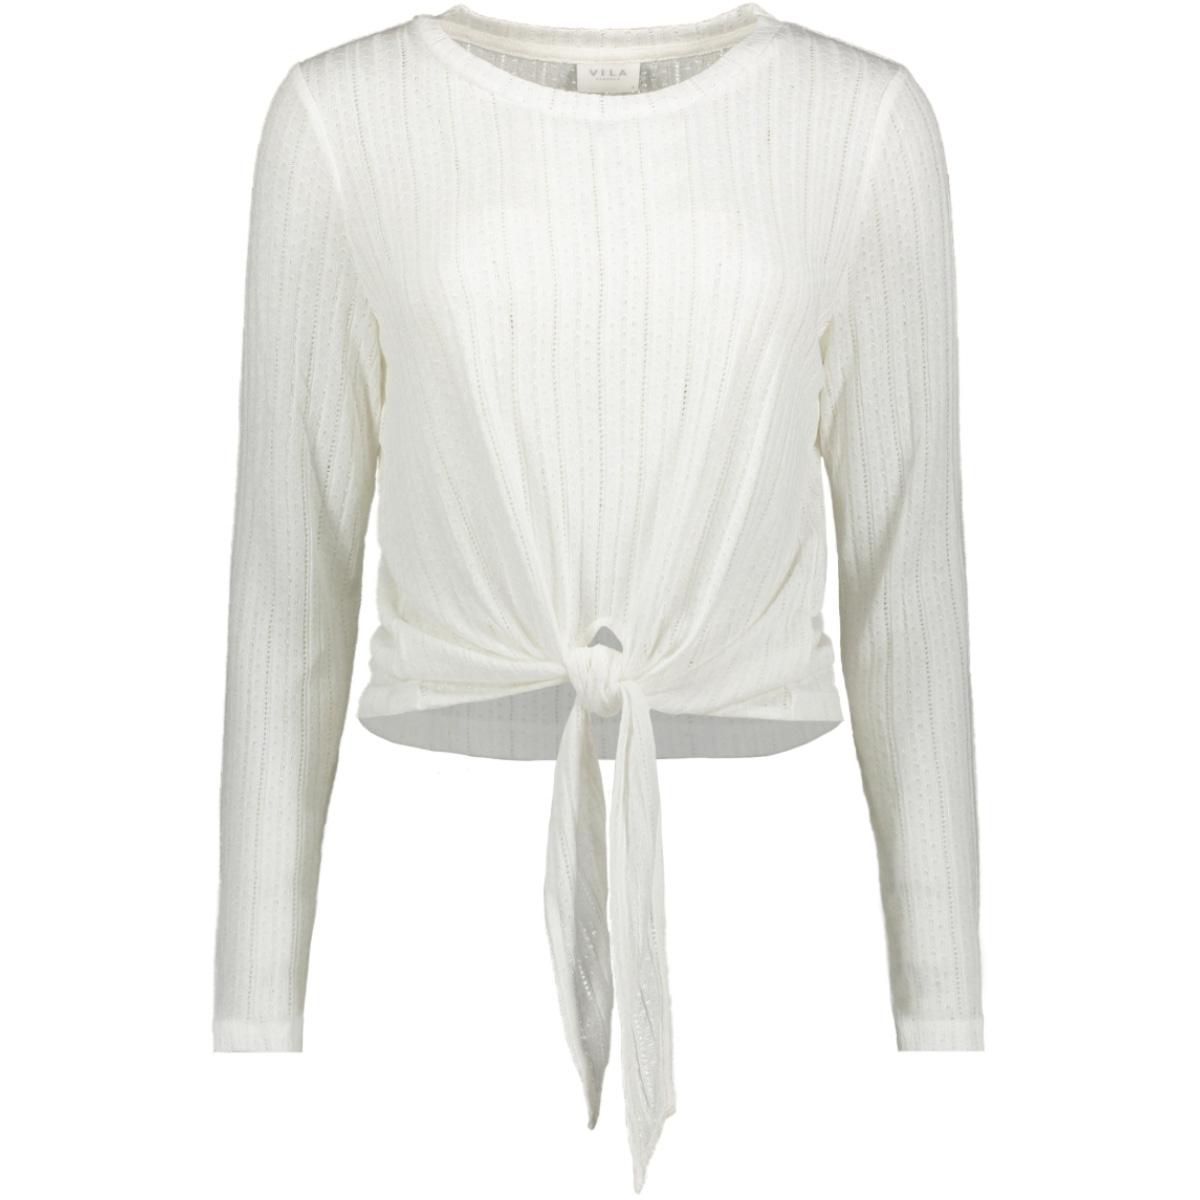 viflori l/s t-shirt/tb 14054509 vila t-shirt cloud dancer